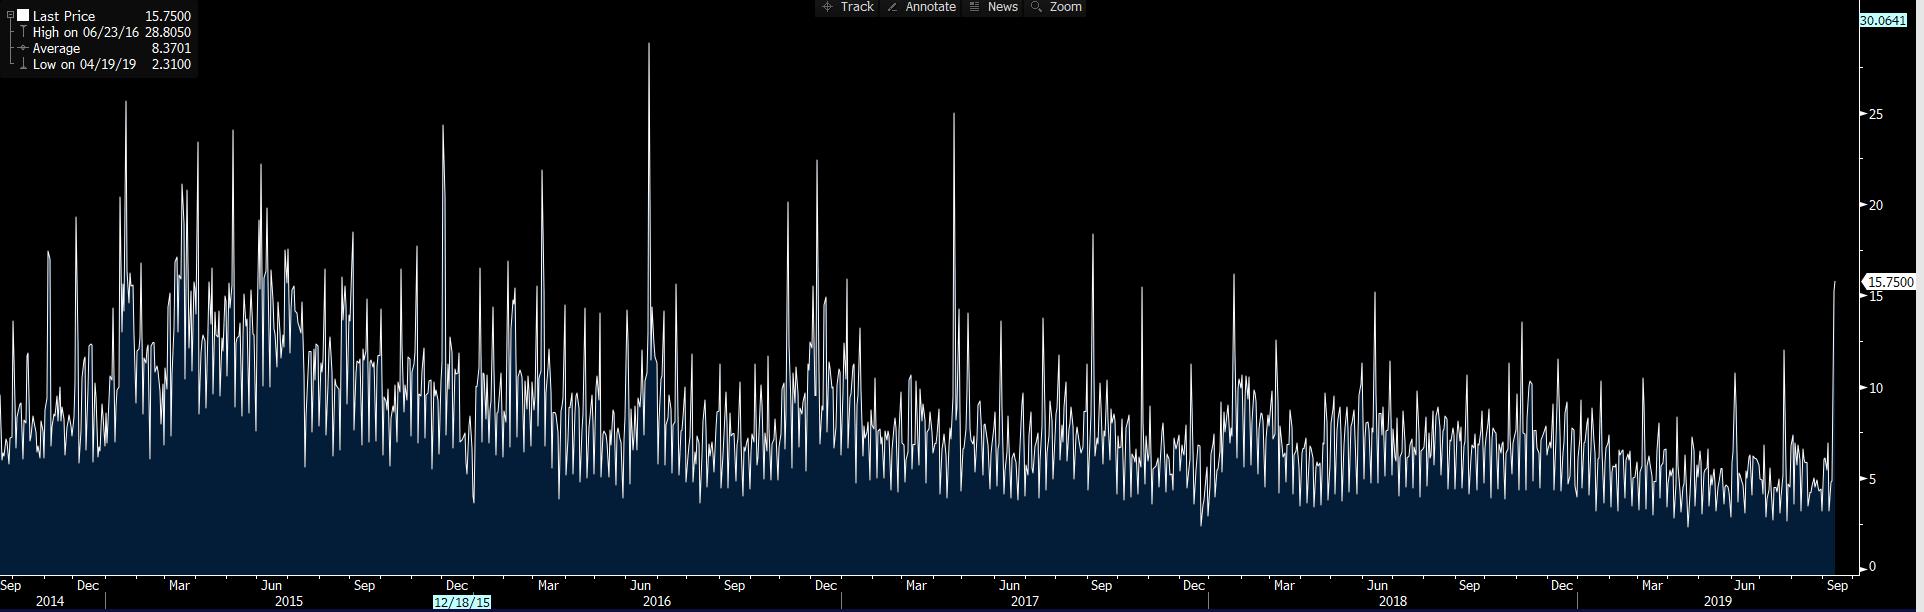 Daily Fix: Market dynamics before ECB meet and US CPI